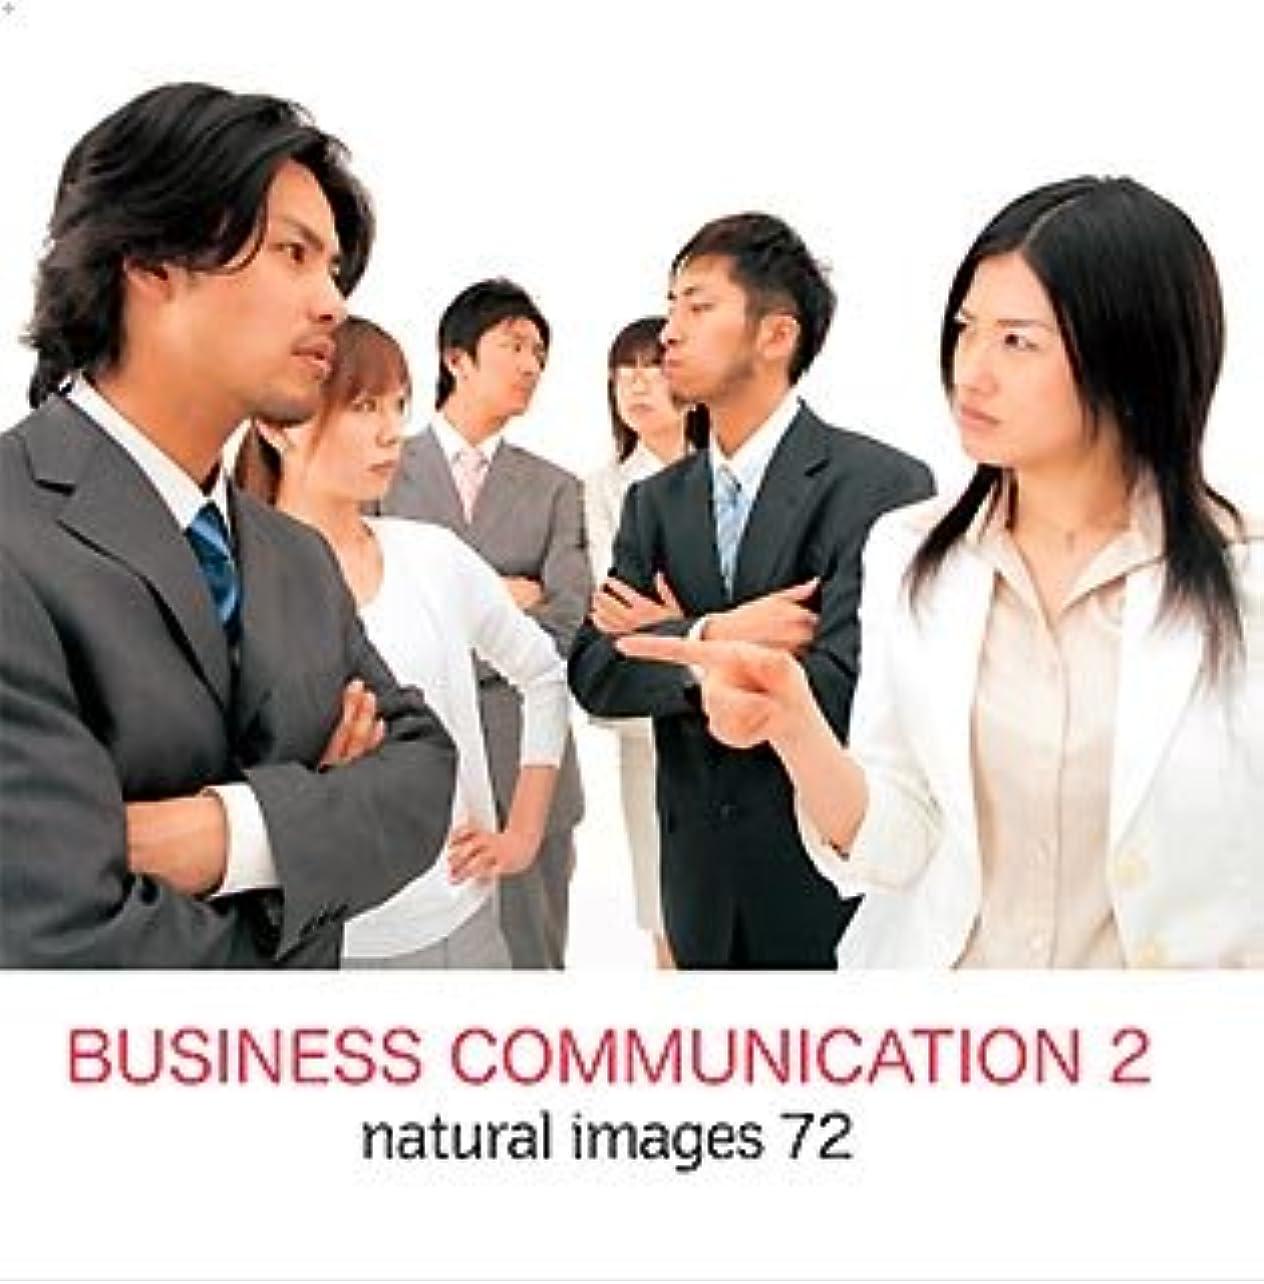 natural images Vol.72 BUSINESS COMMUNICATION 2